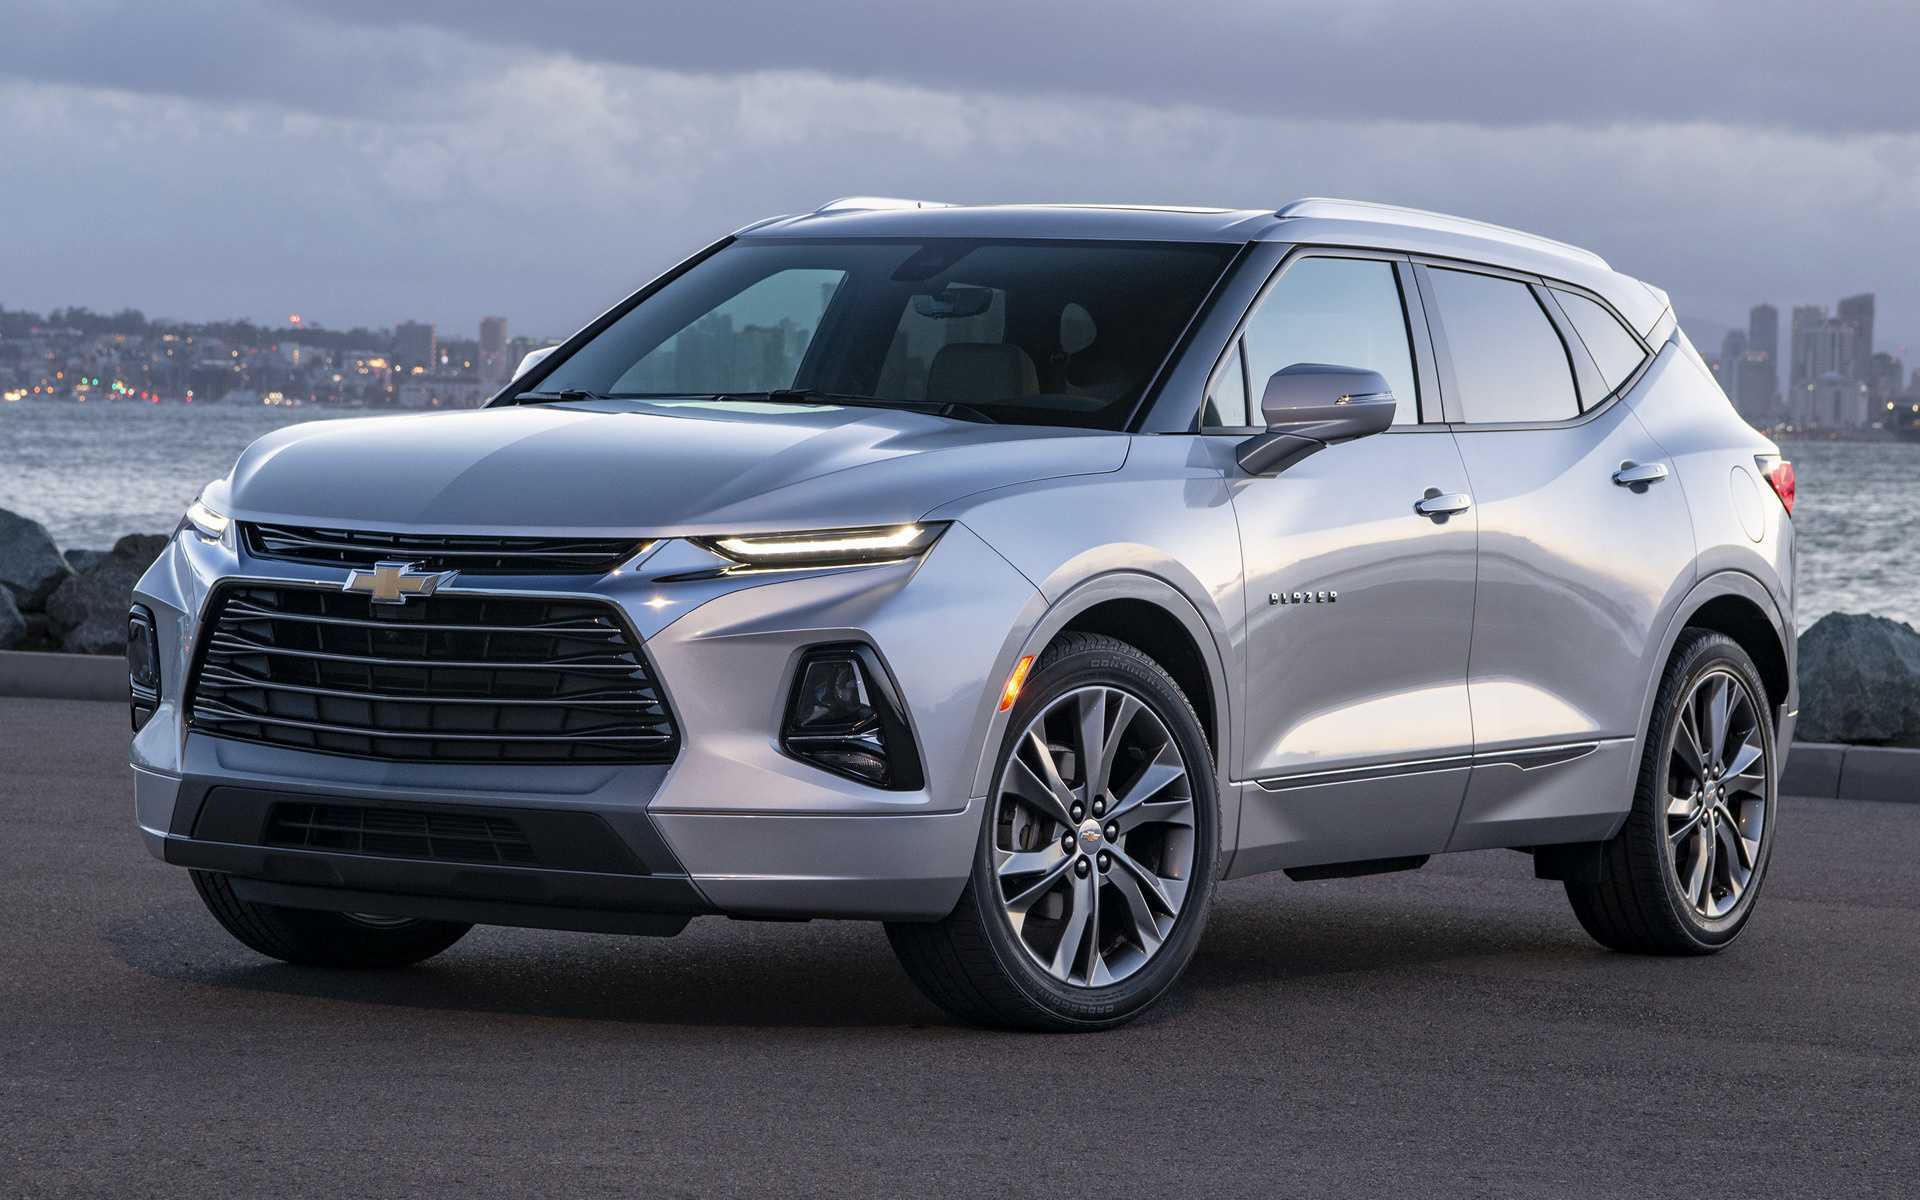 2019 Chevrolet Blazer - Fondos de Pantalla e Imágenes en ...